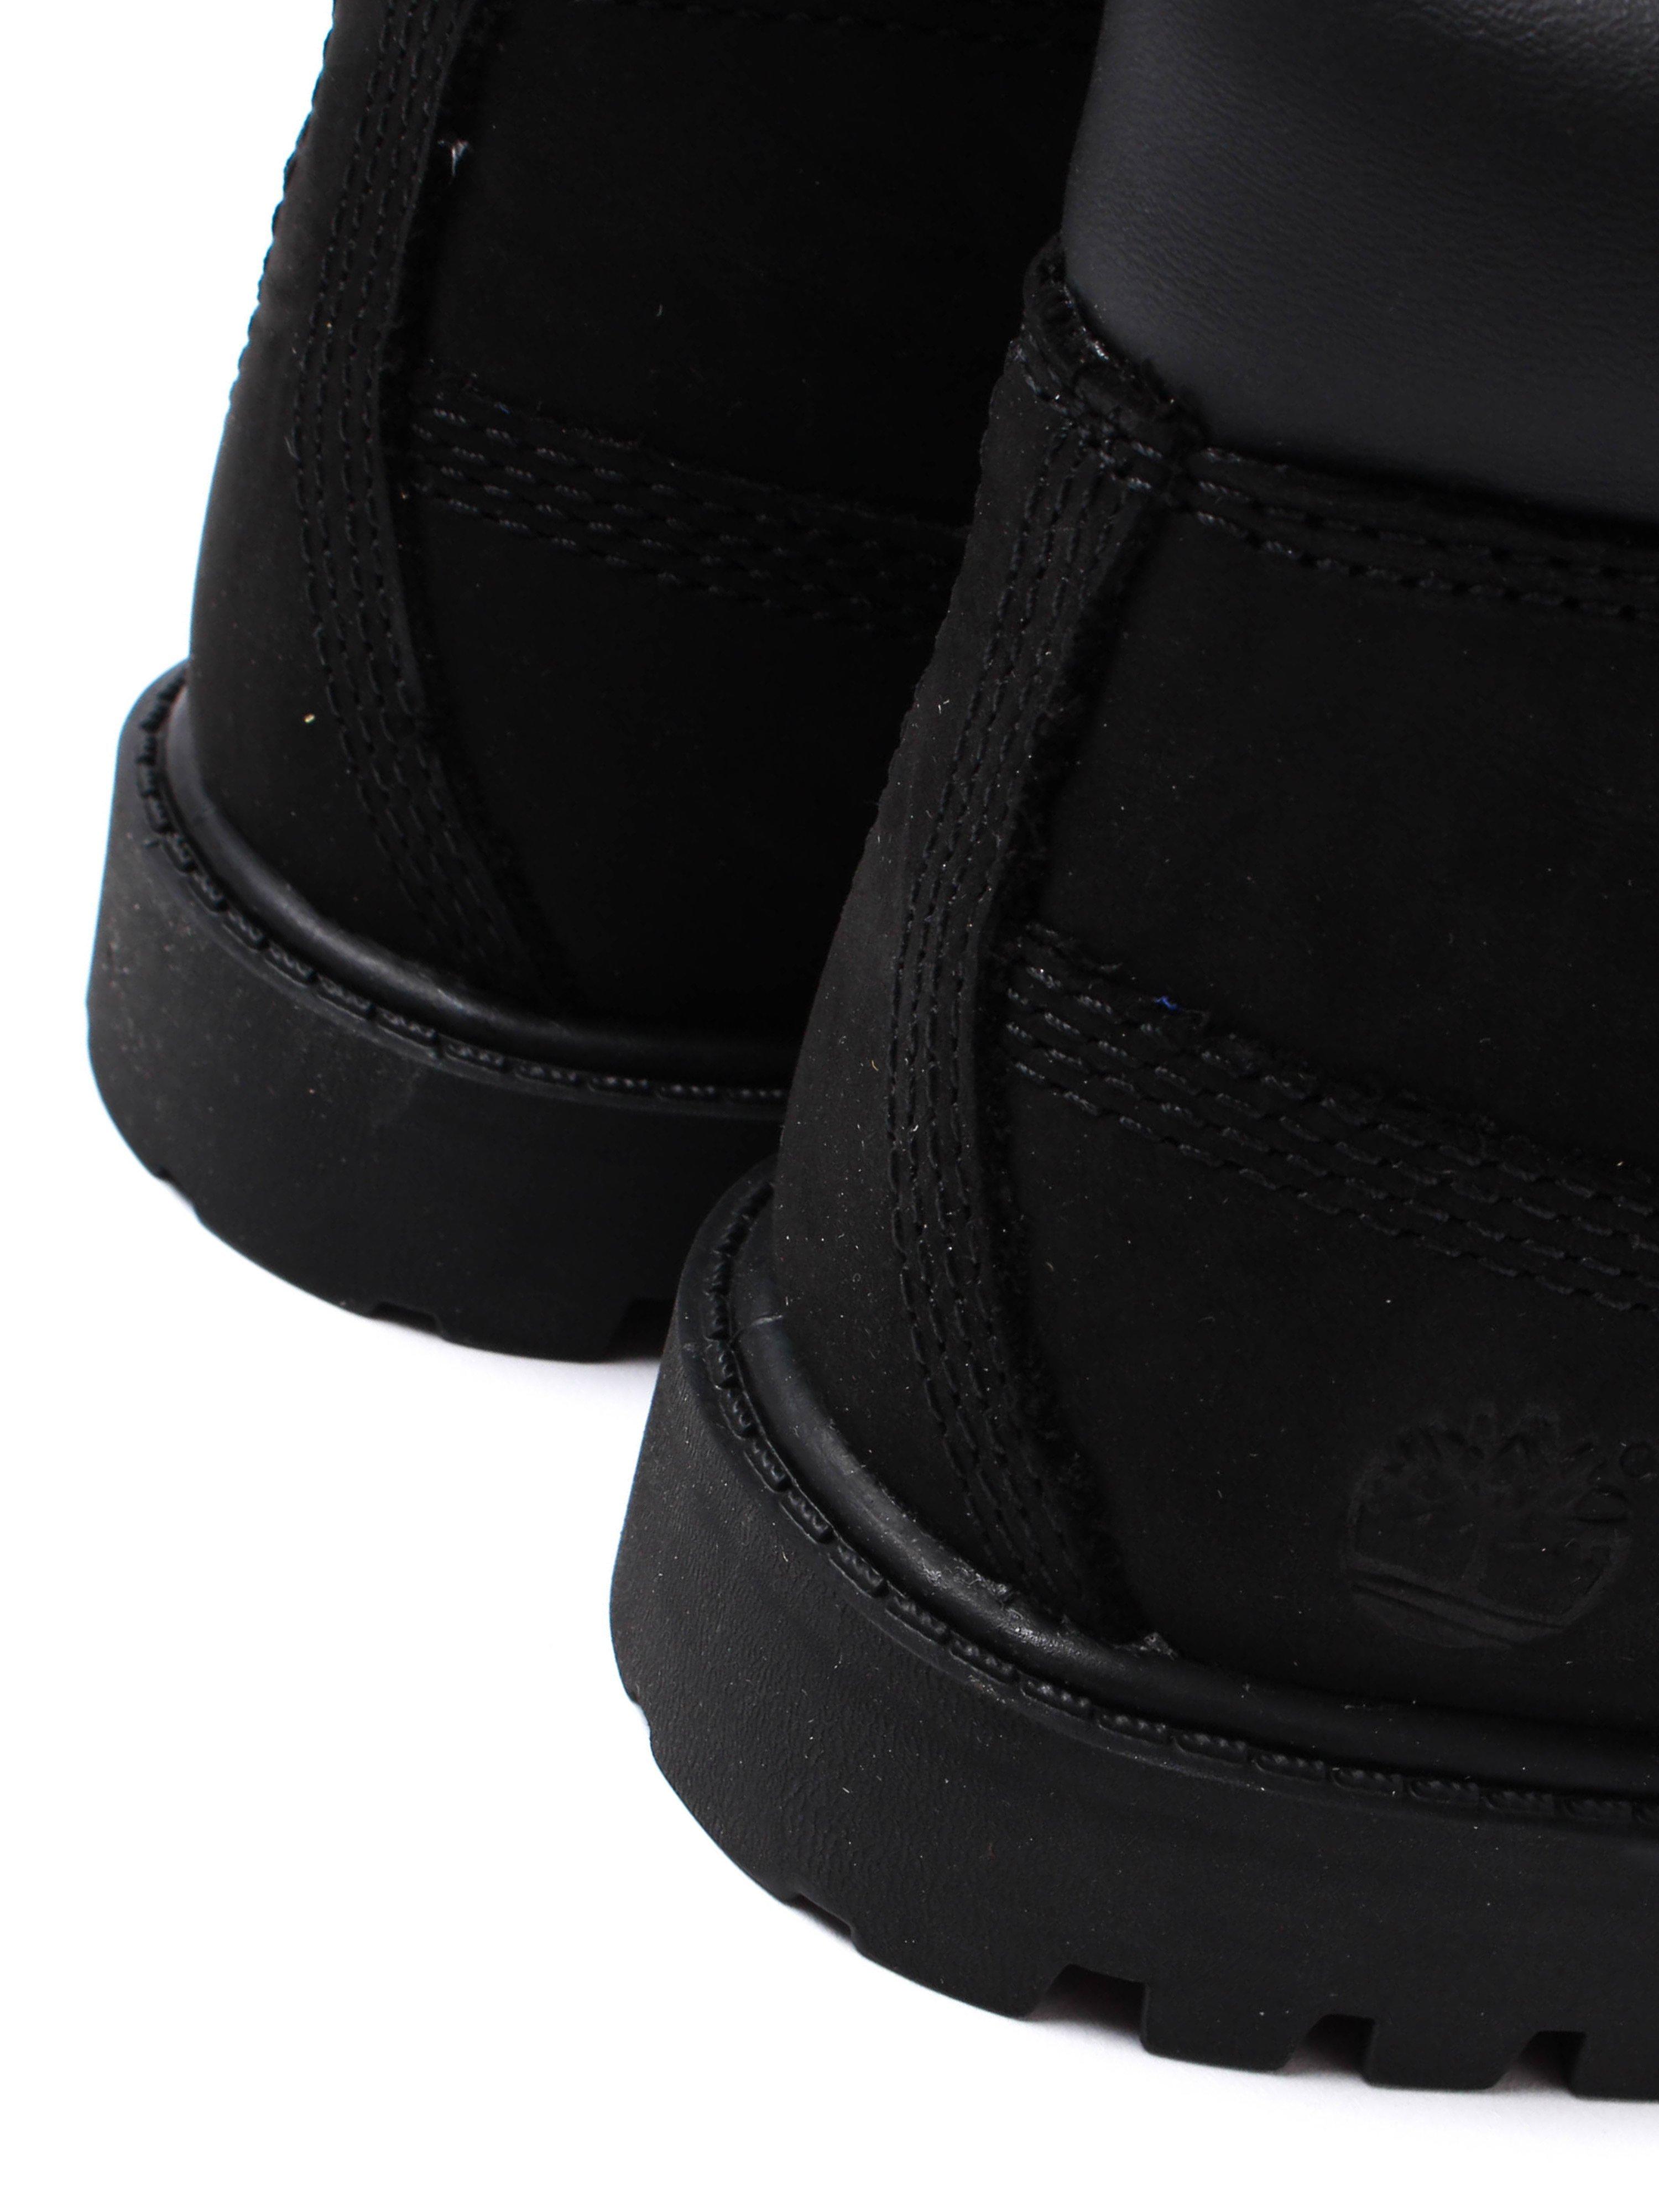 Timberland Infant 6 Inch Premium - Black Nubuck